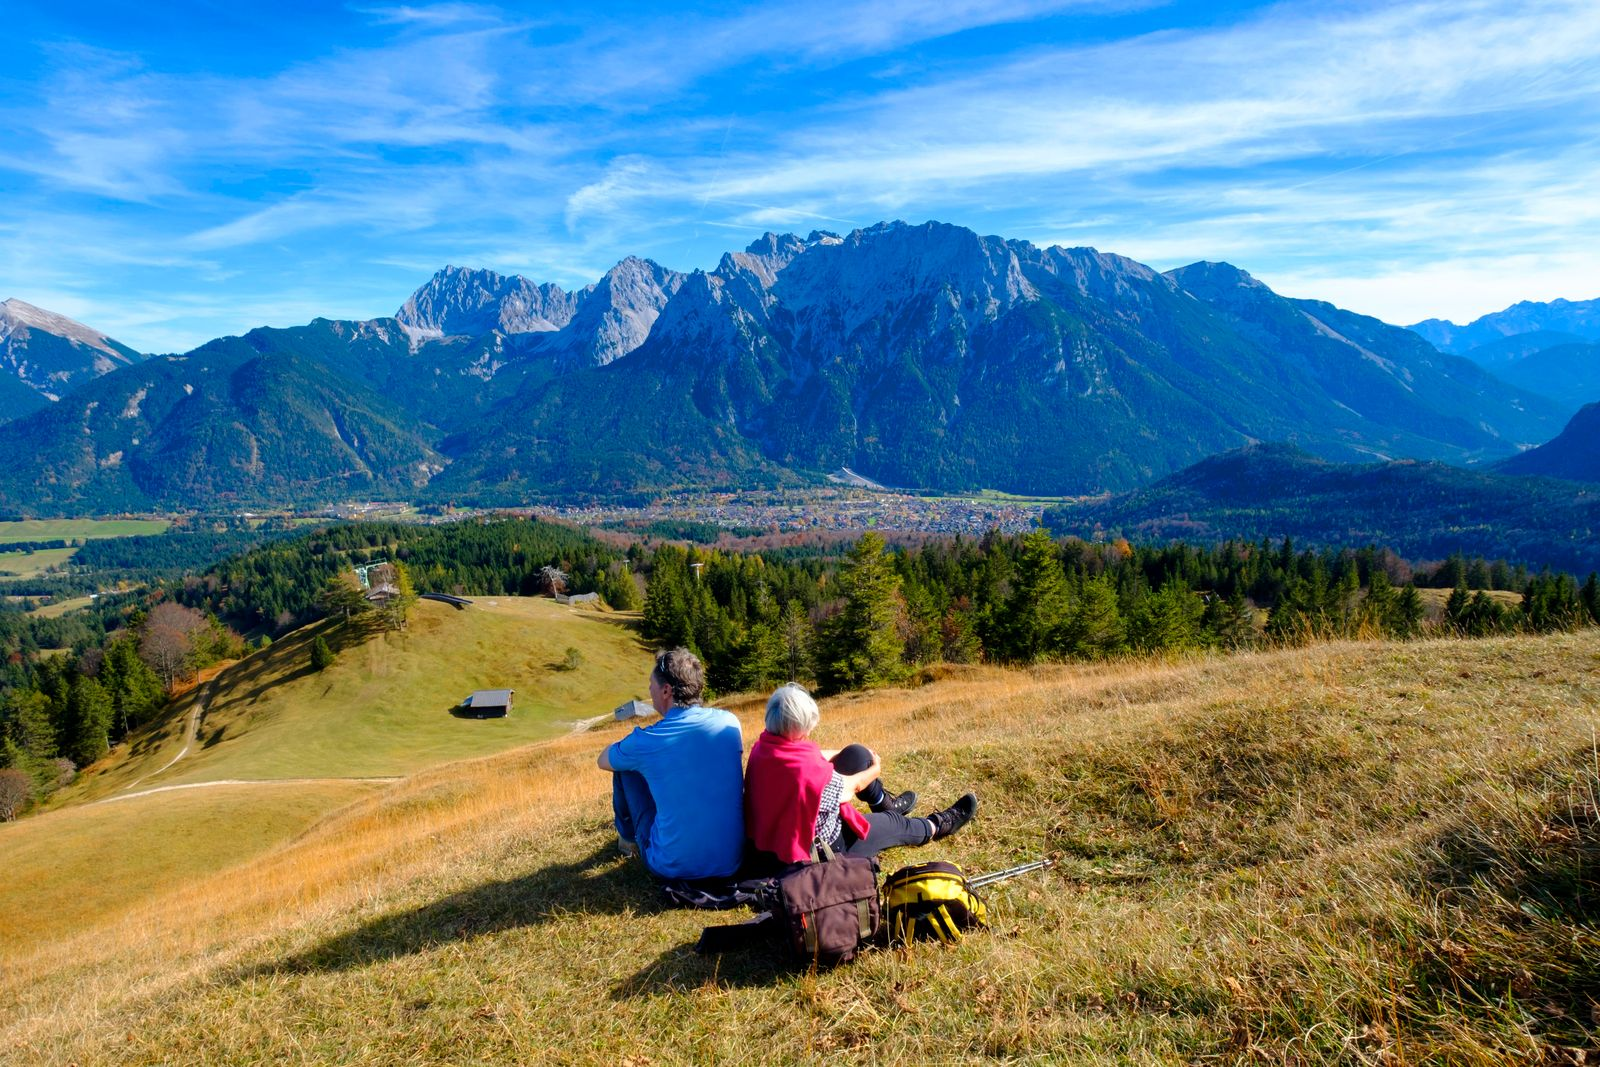 Mountaineers, hikers resting at the summit, Kranzberg, near Mittenwald, Werdenfelser Land, Upper Bavaria, Bavaria, Germany